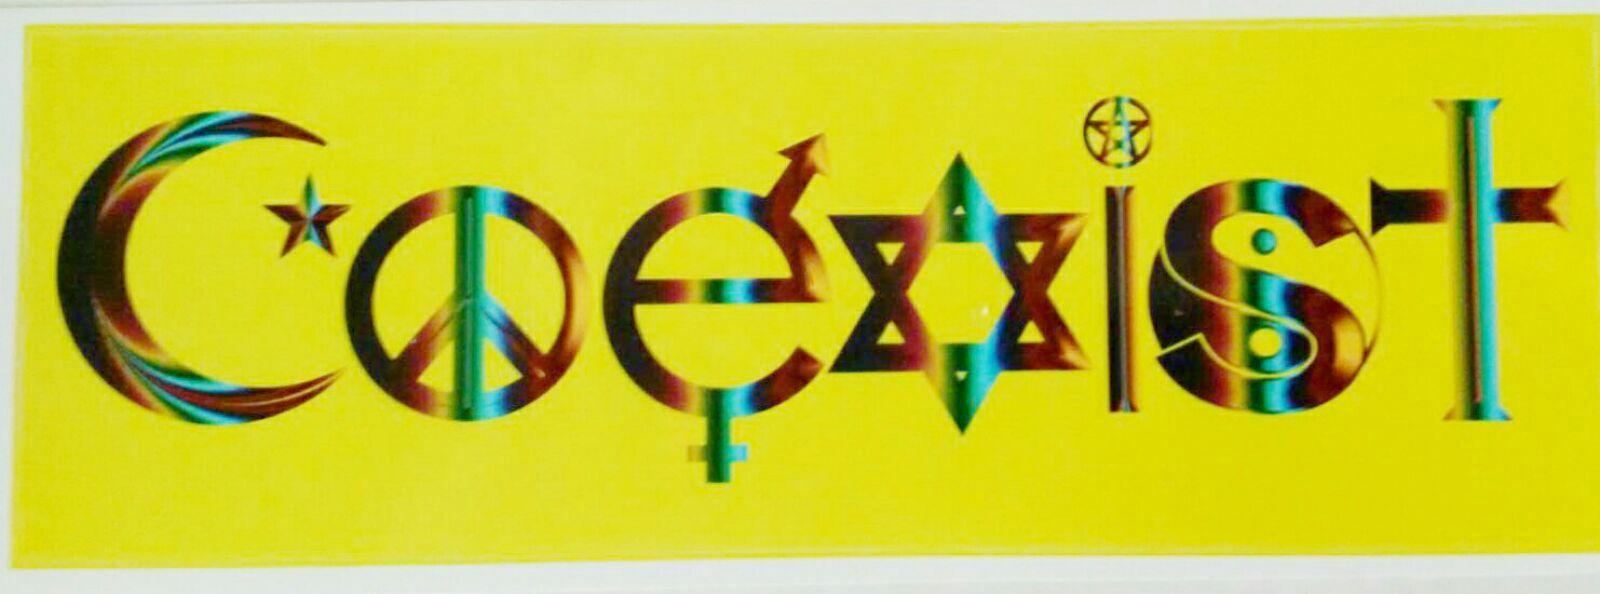 Bumper Sticker Coexist Symbols Peace Evolution Harmony Rainbow Style